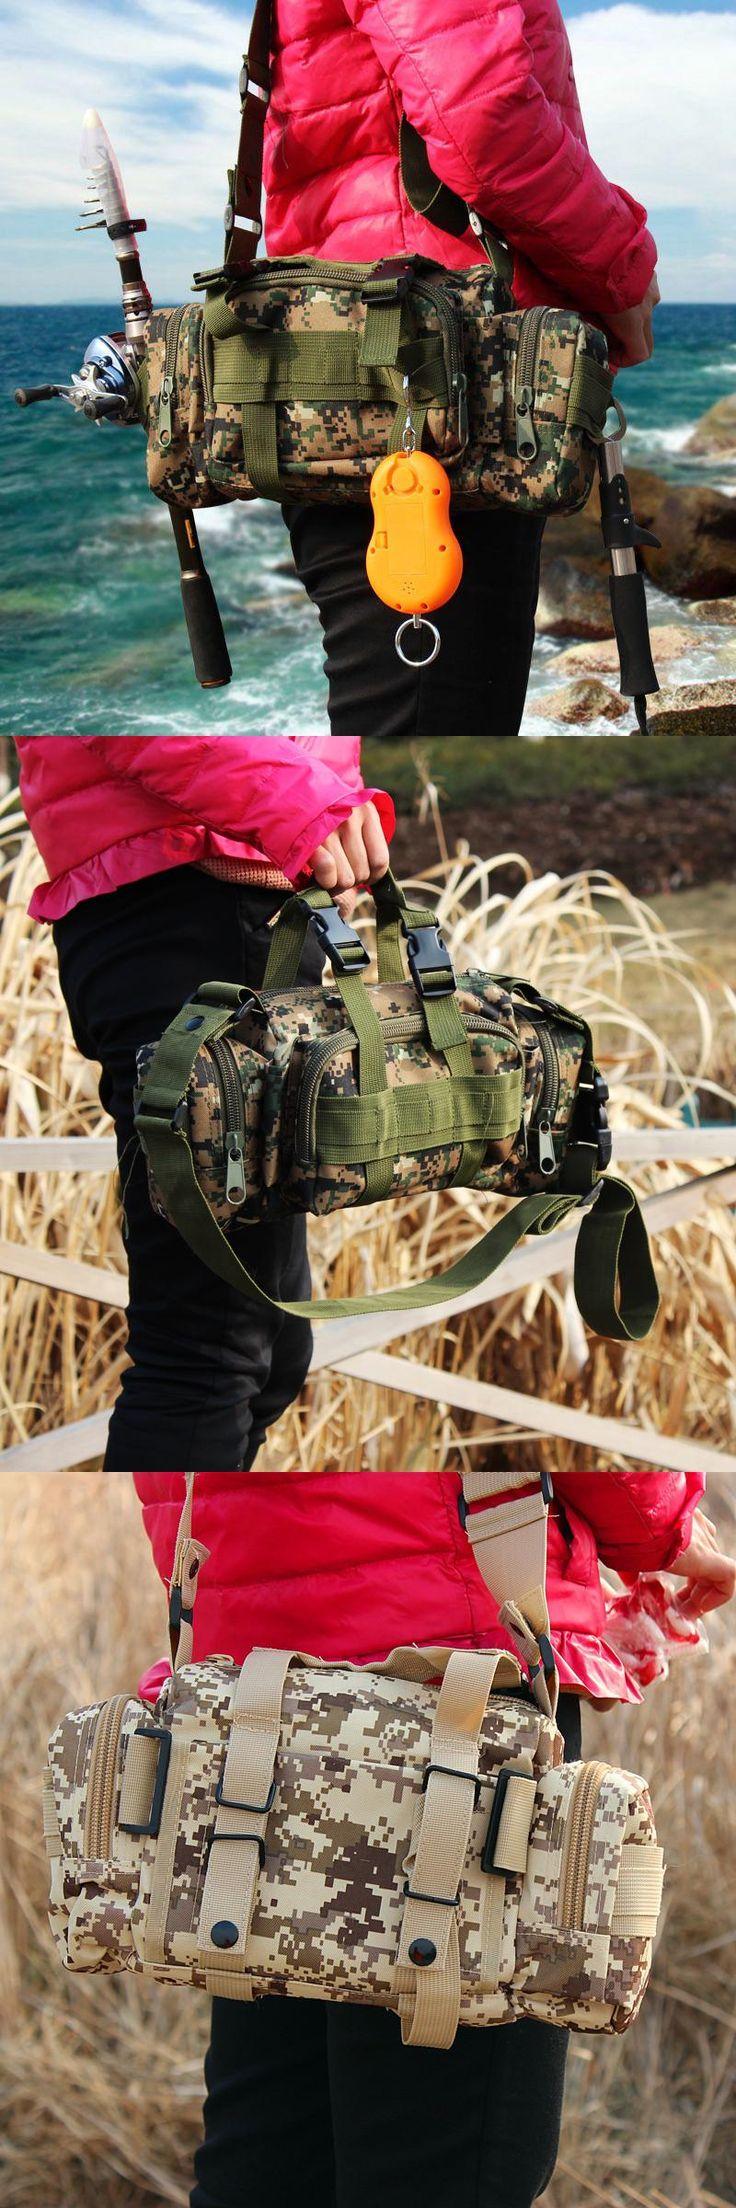 Fishing tackle craft supplies -  Visit To Buy 2016 New Multi Purpose Lure Fishing Bag Outdoor Camping Hiking